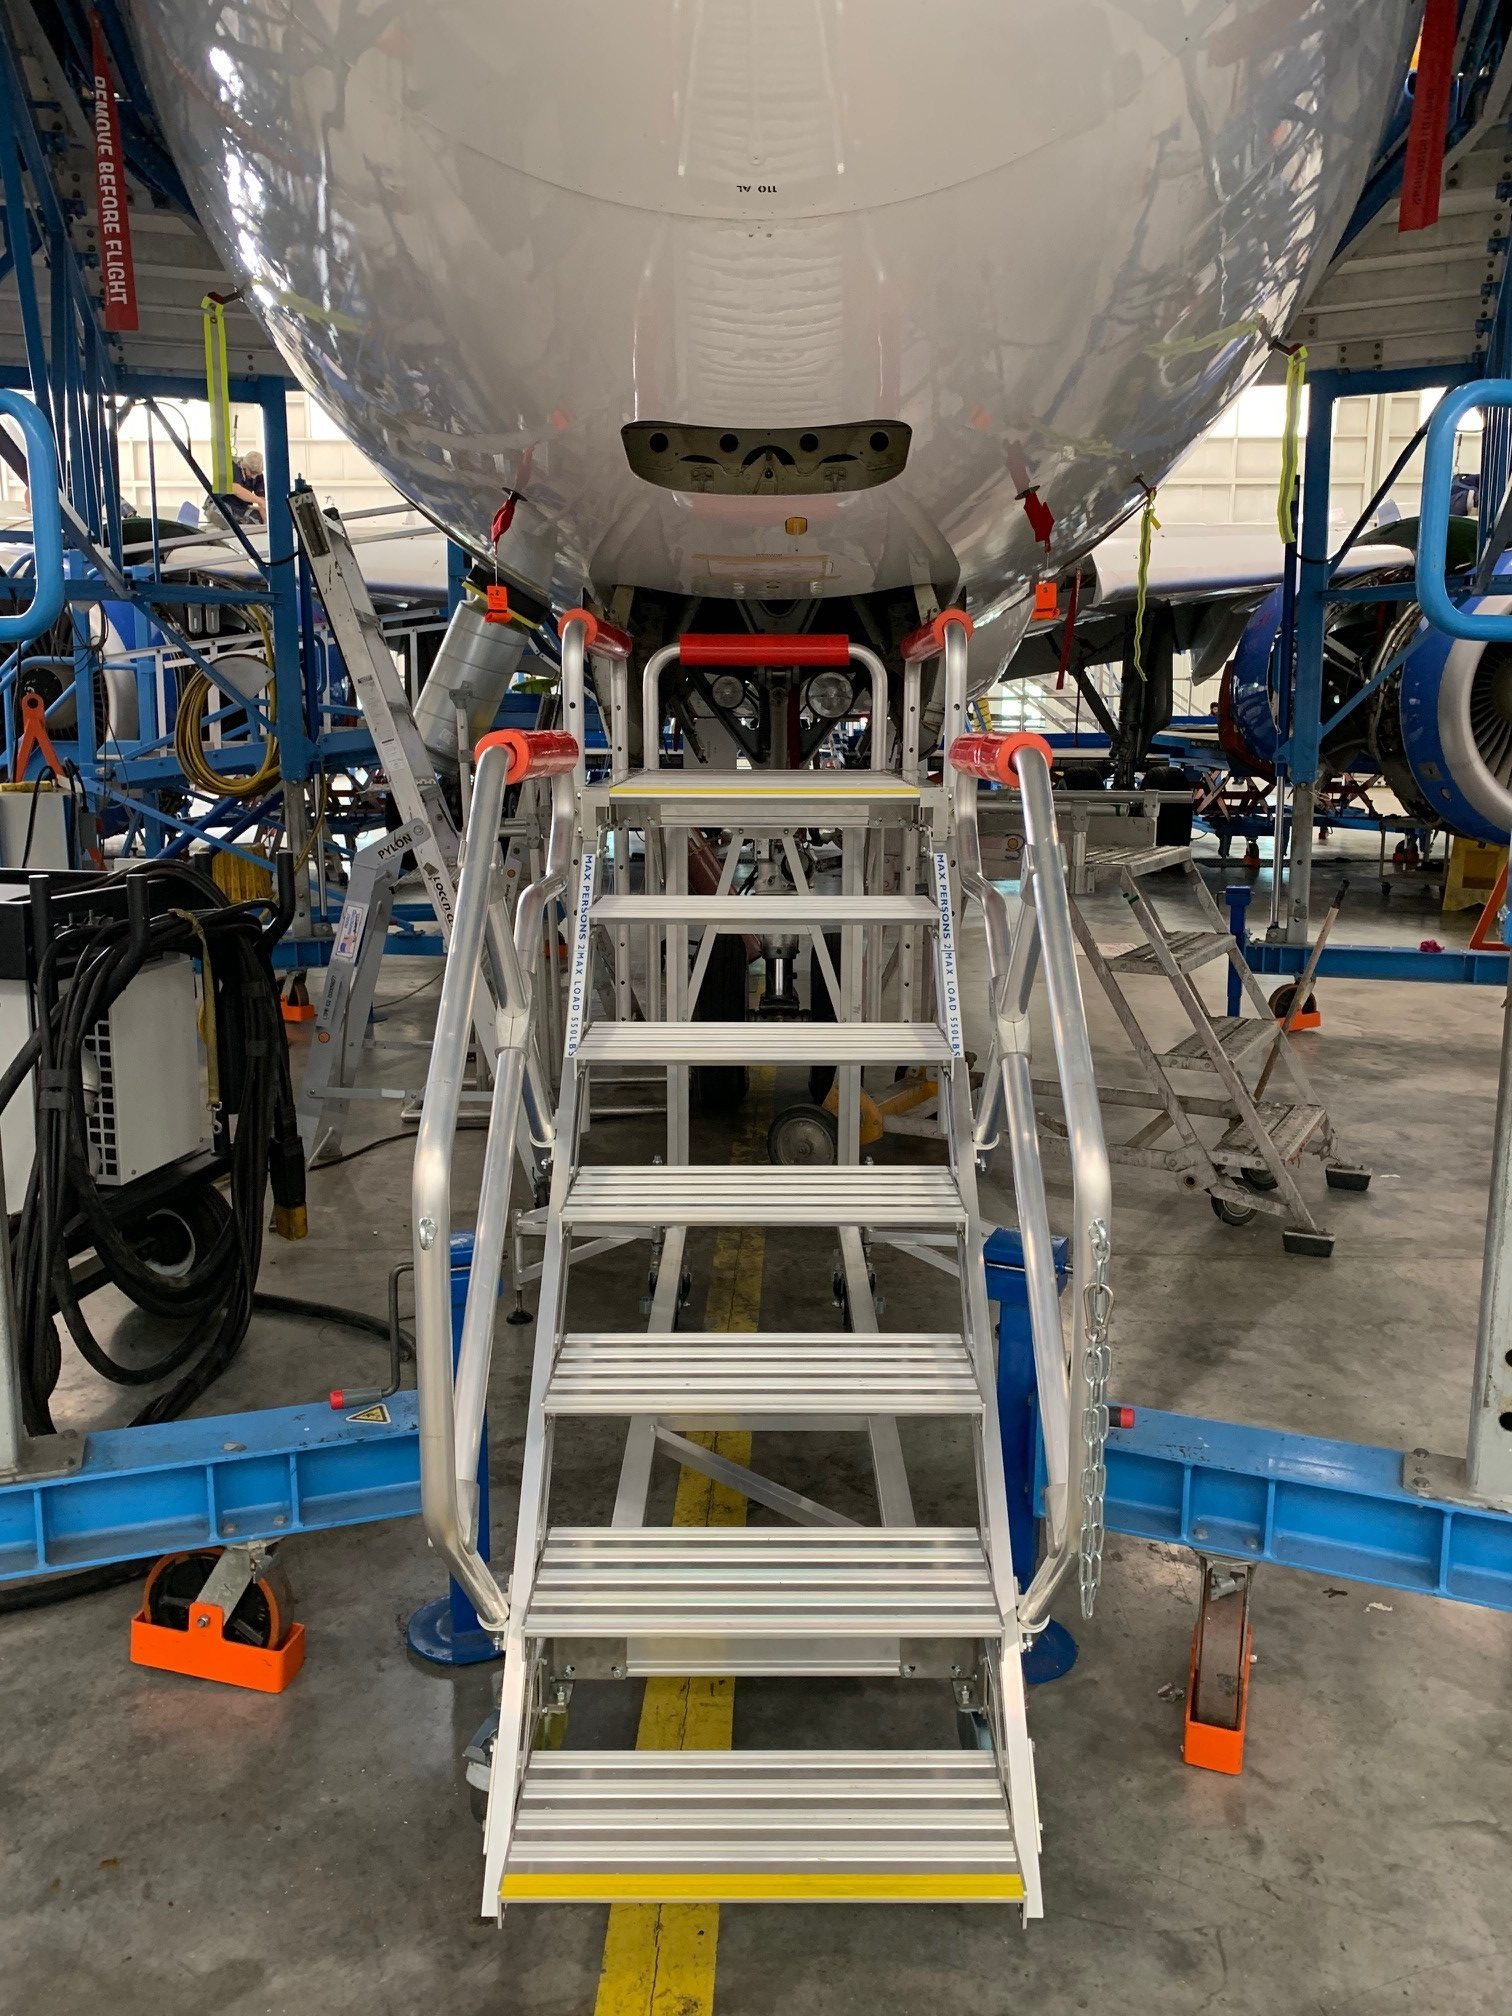 Lufthansa Technik Puerto Rico: standardising access to the intricate nose avionics area